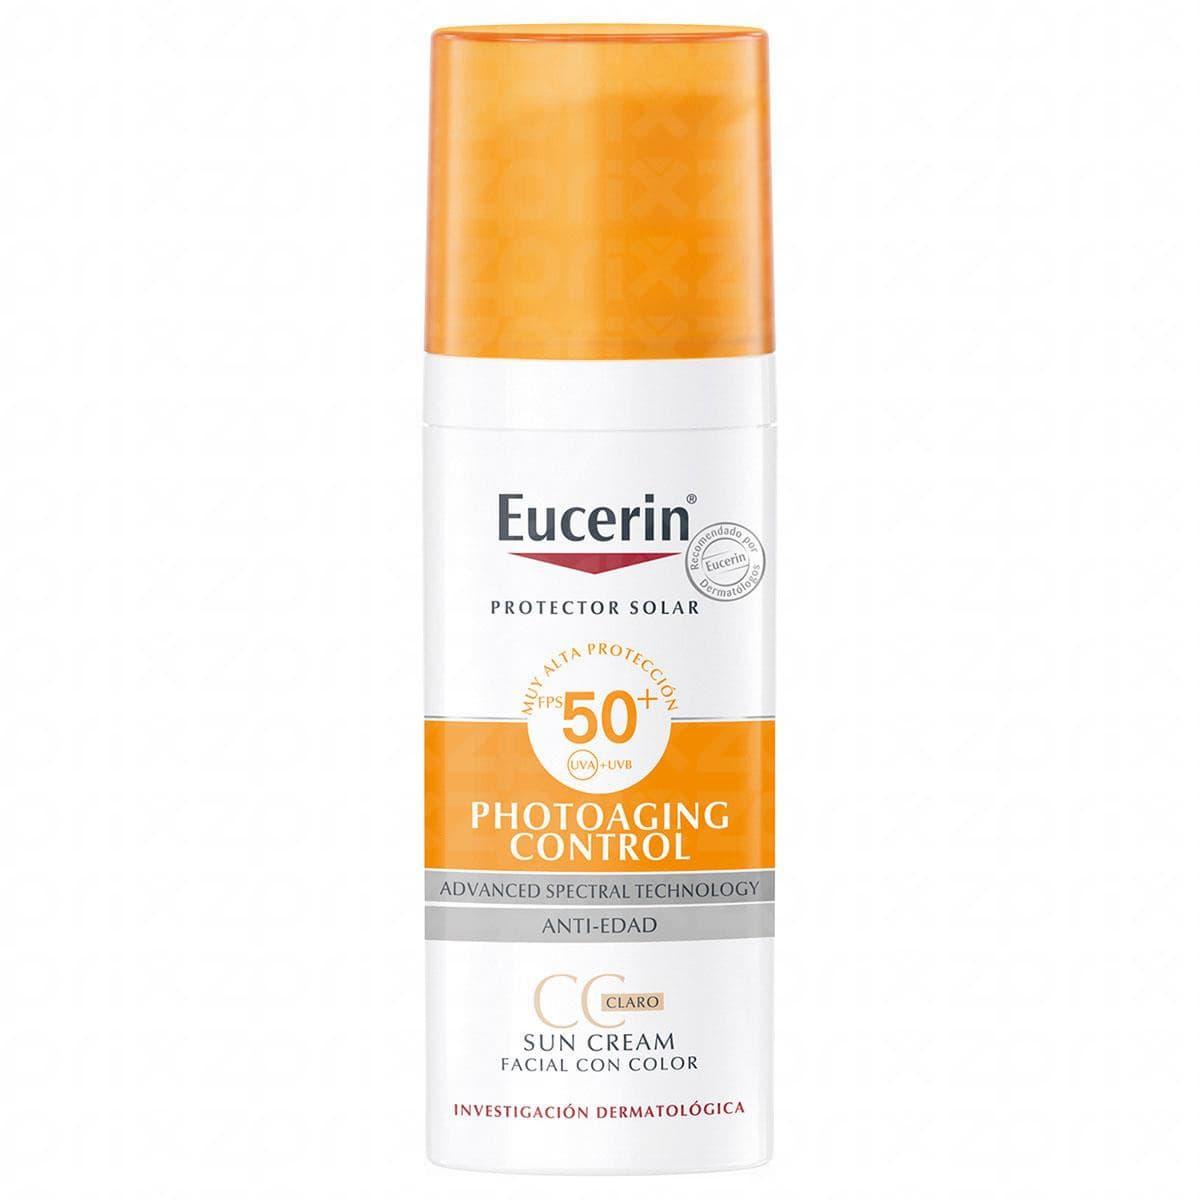 Eucerin Sun creme con color tono claro SPF 50 con 50 ml